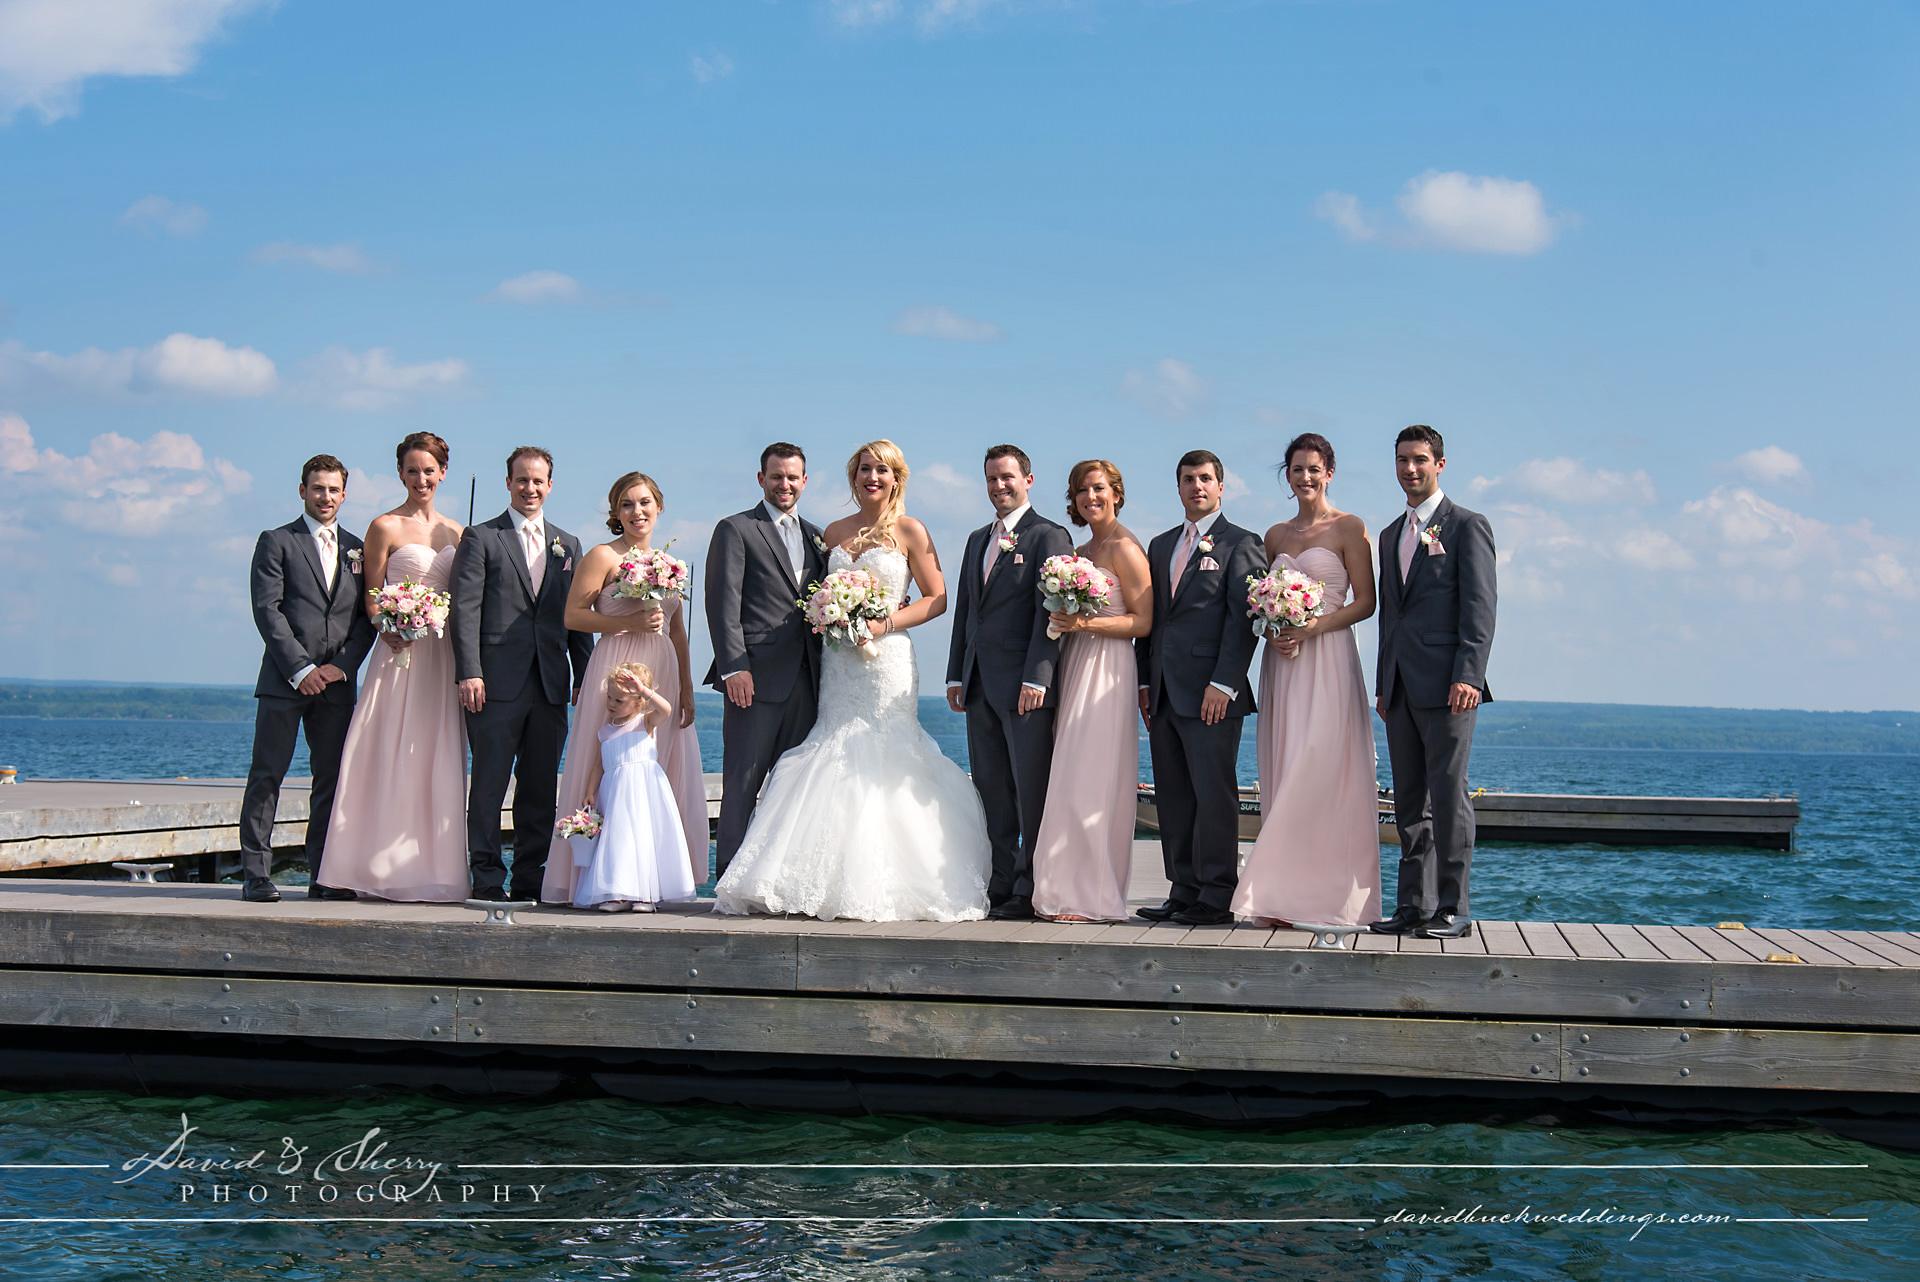 Cobble_Beach_Wedding_Photography_018